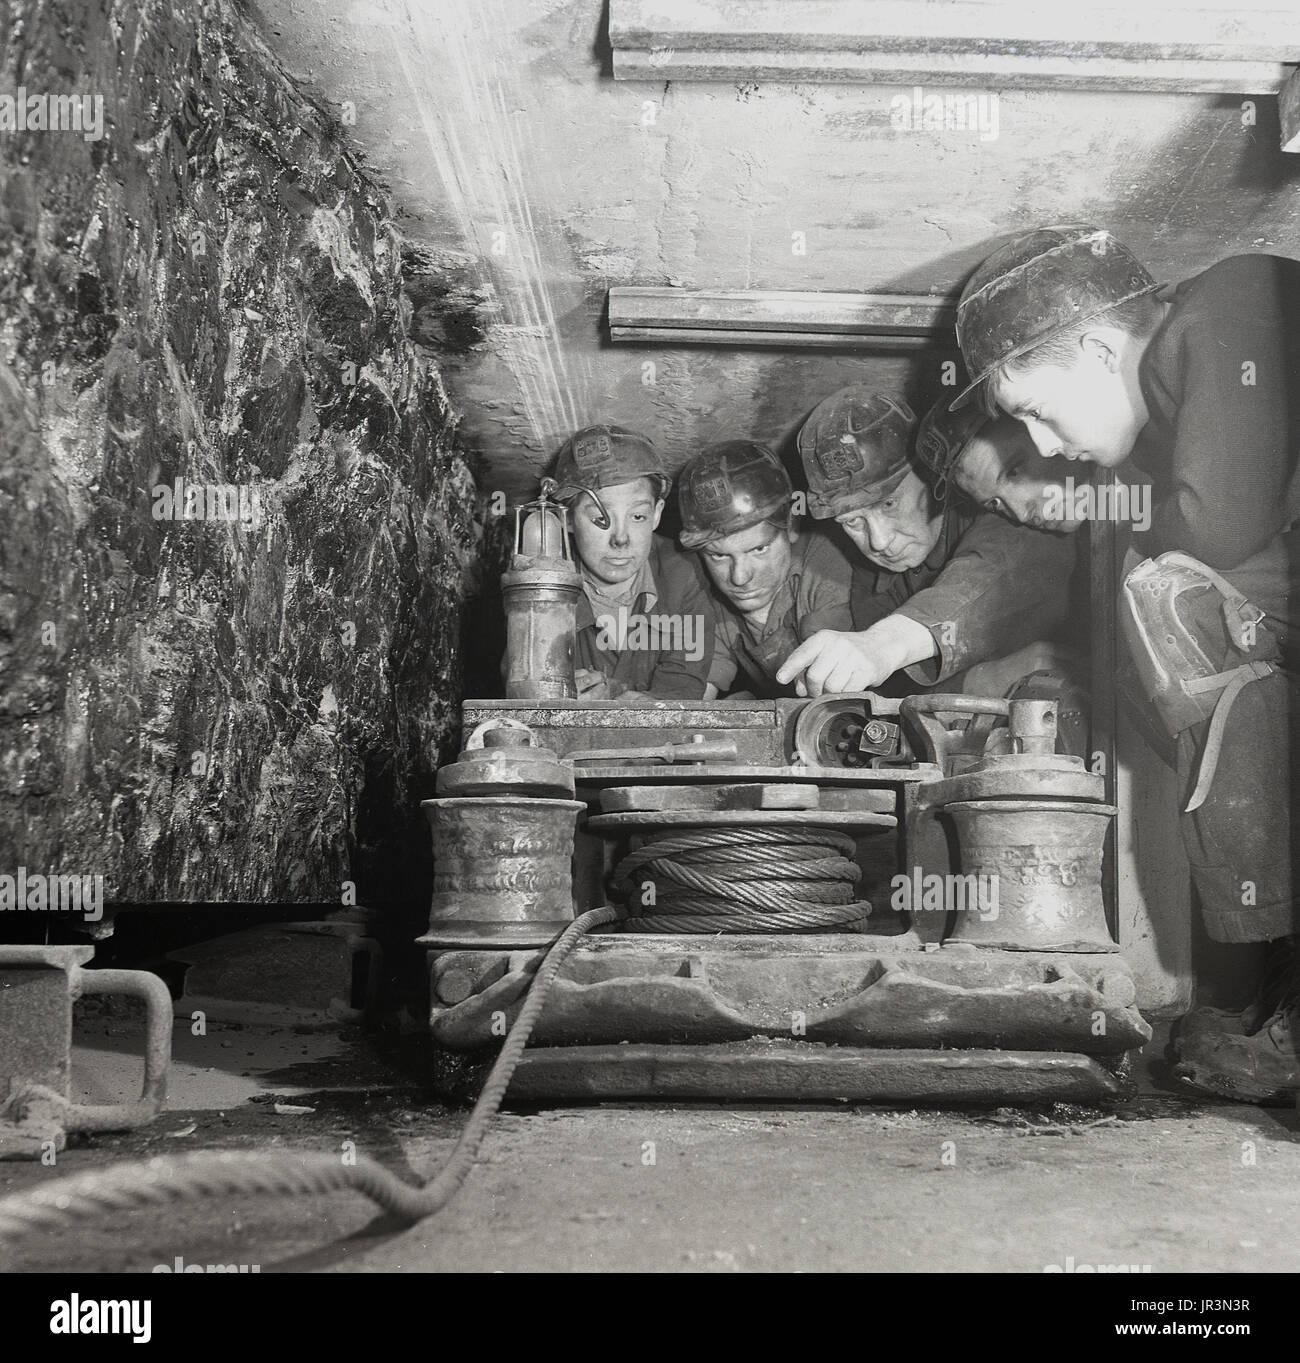 coal mining miners stockfotos coal mining miners bilder seite 3 alamy. Black Bedroom Furniture Sets. Home Design Ideas